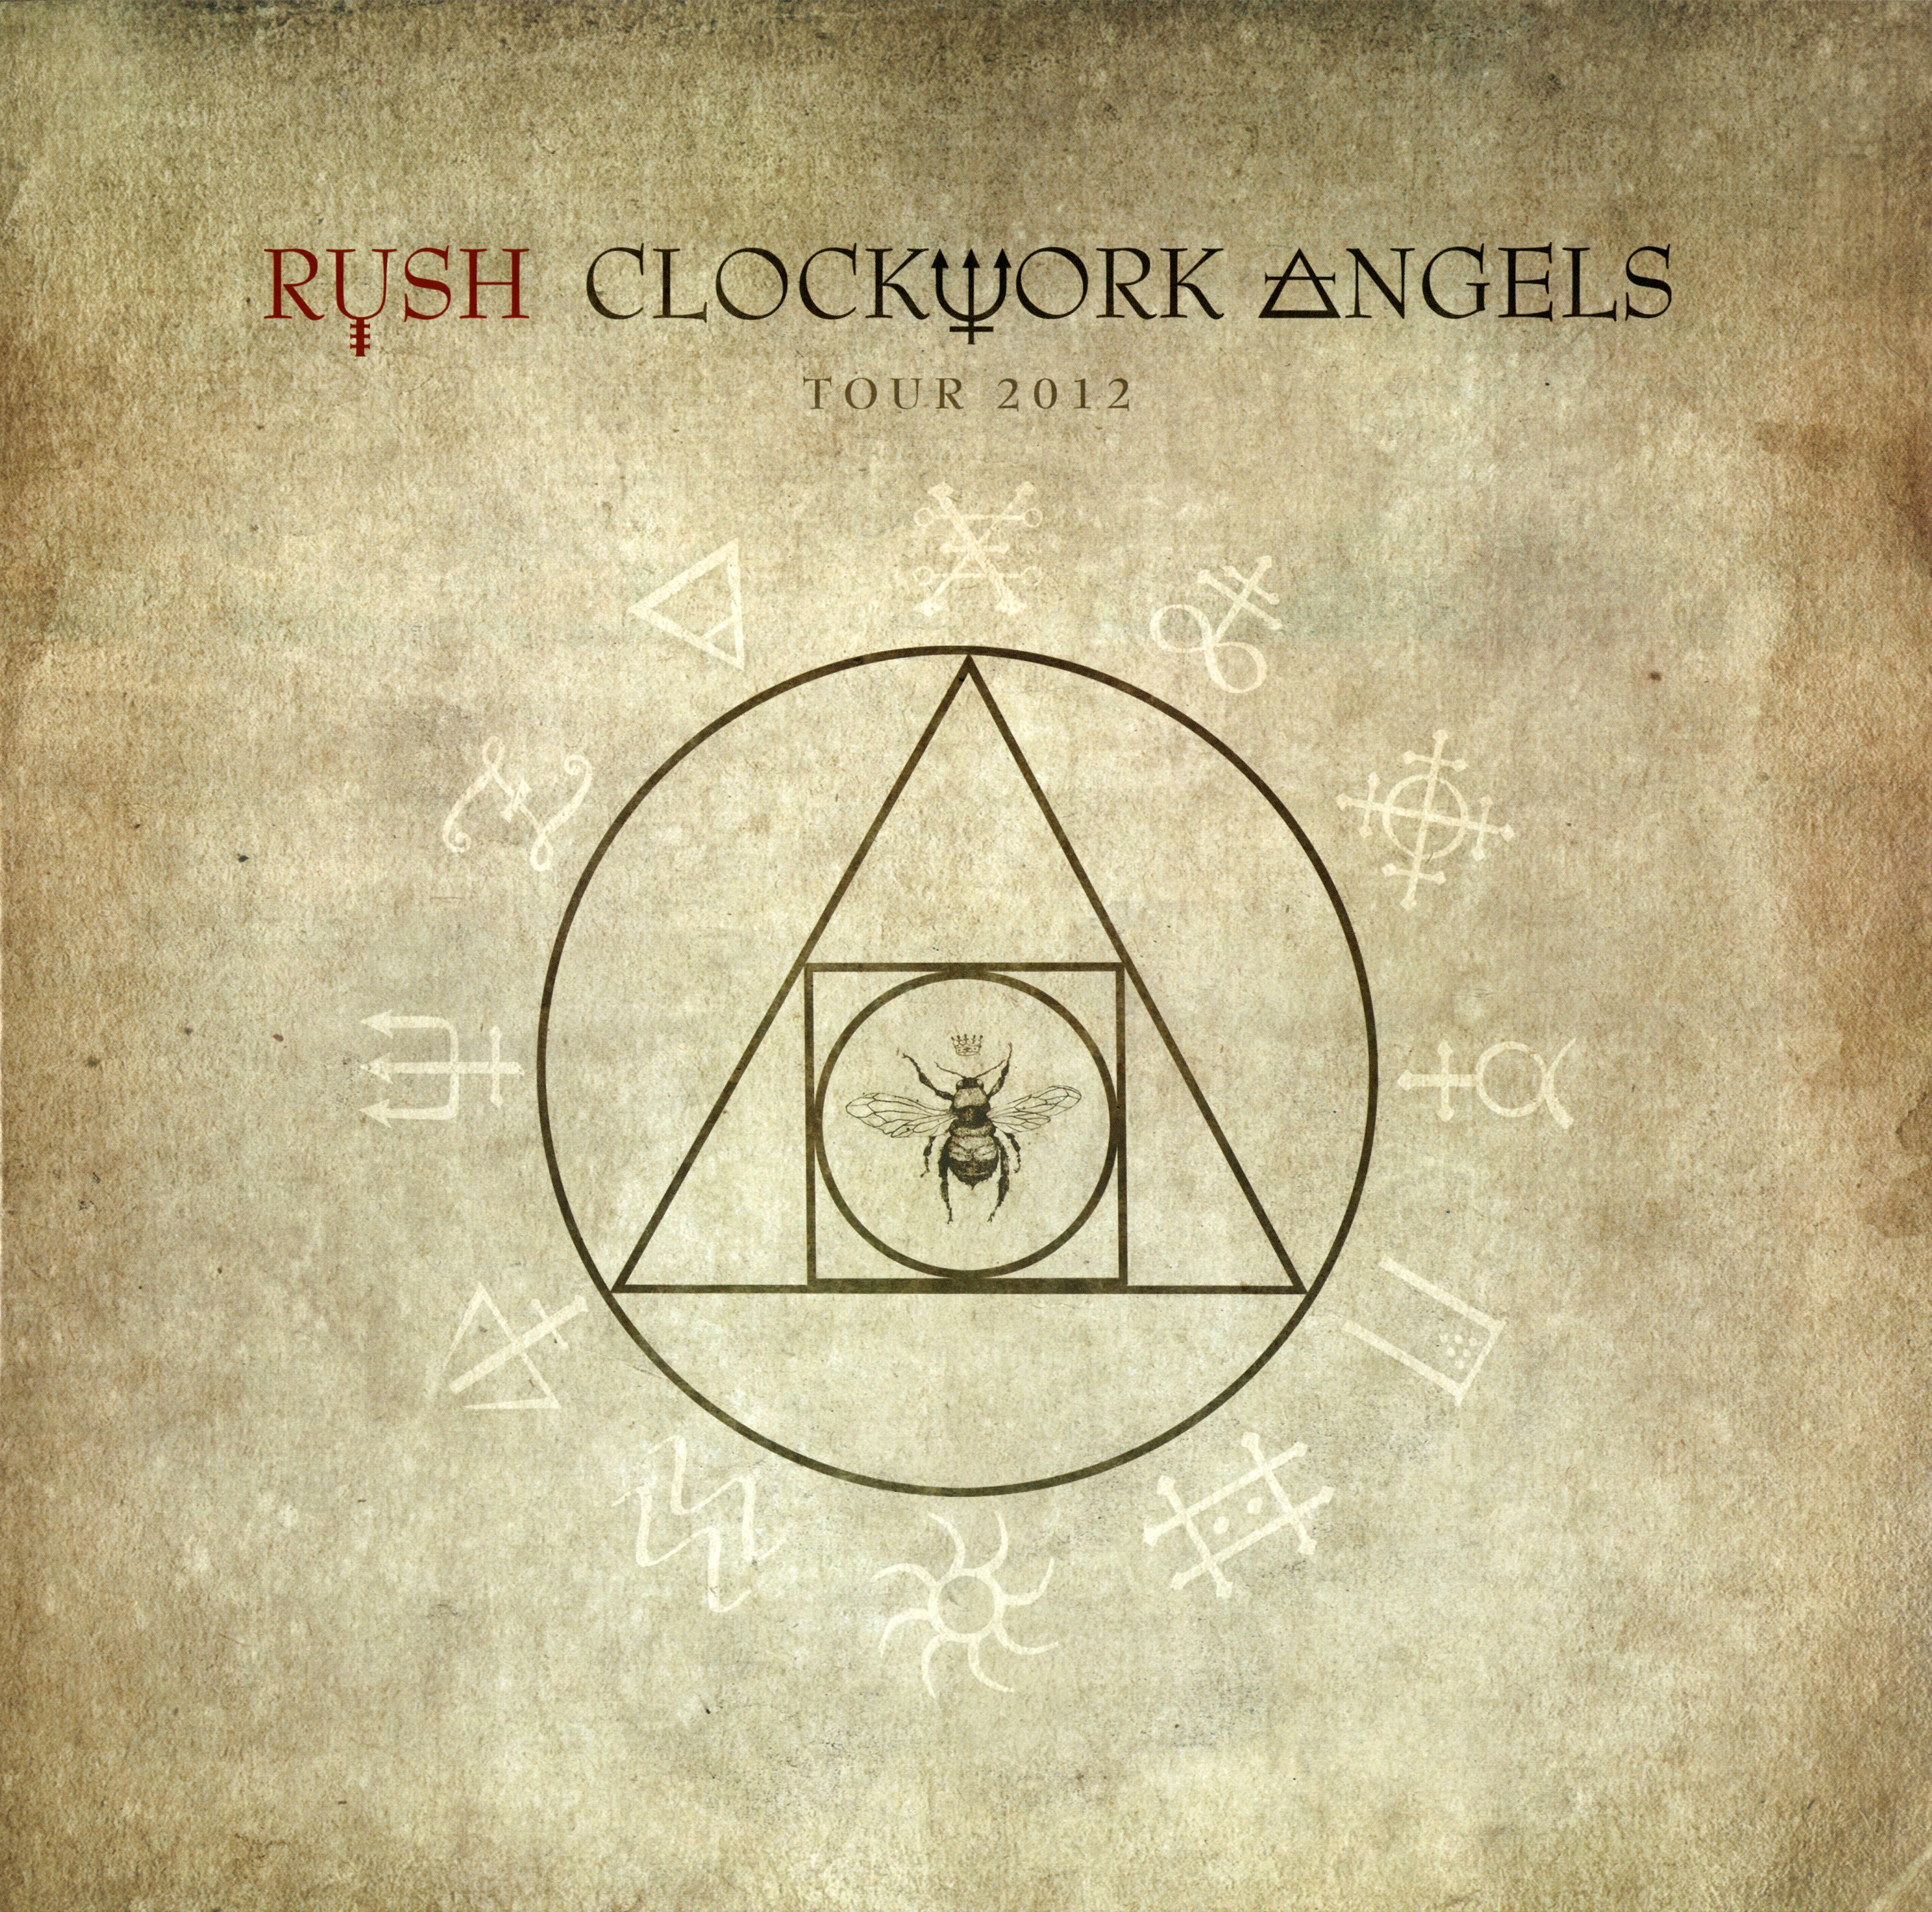 Rush: Clockwork Angels 2012 Tour Book - Artwork and ...   Rush Clockwork Angels Graphics